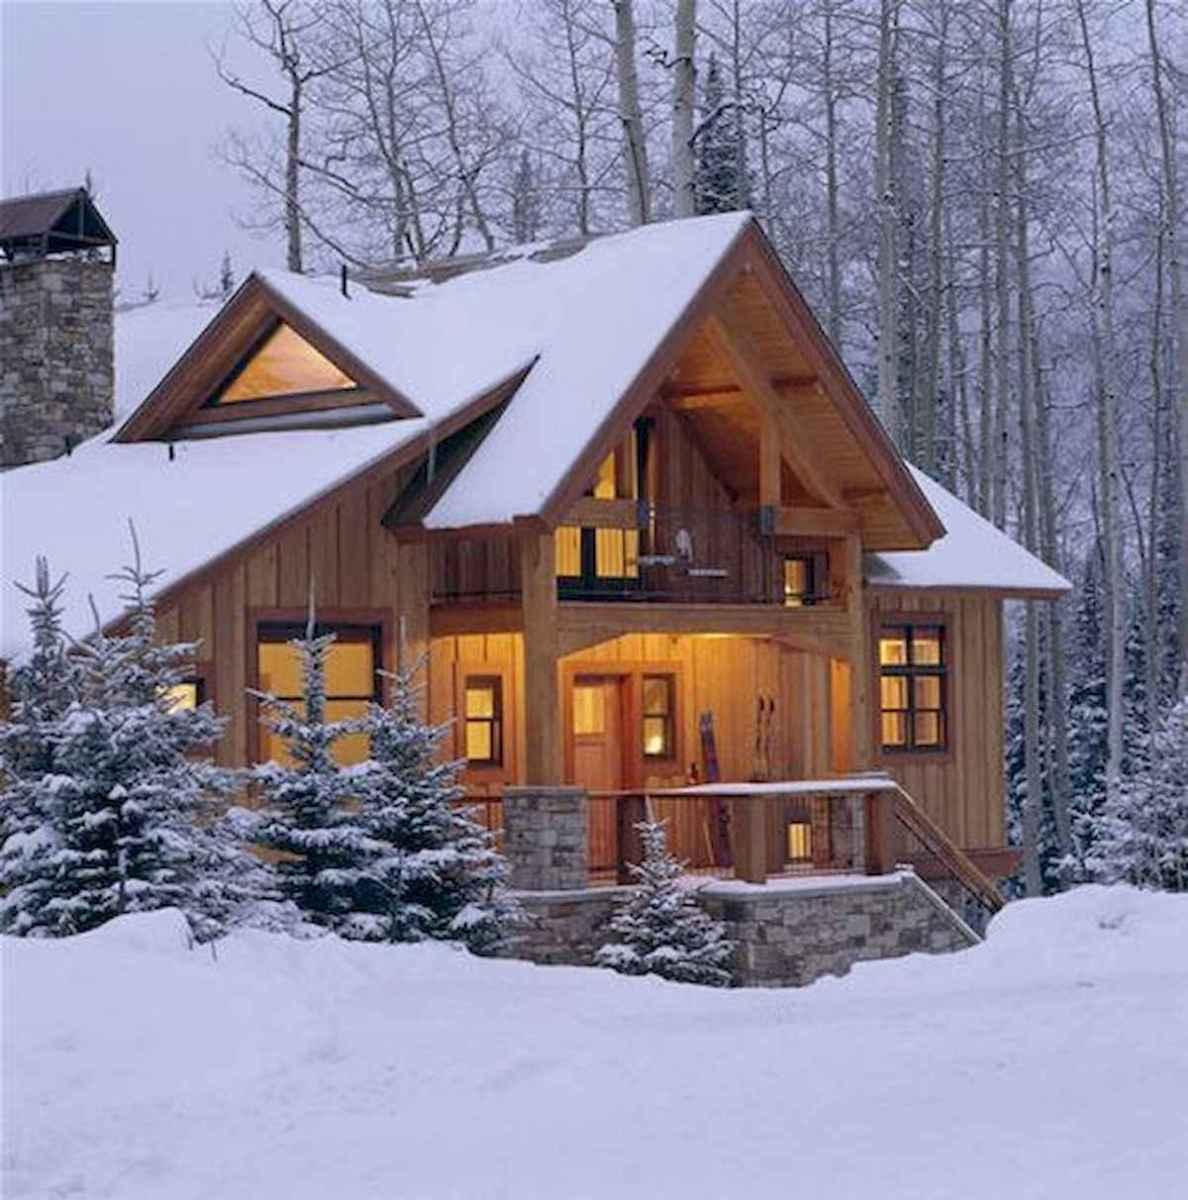 75 Great Log Cabin Homes Plans Design Ideas (7)